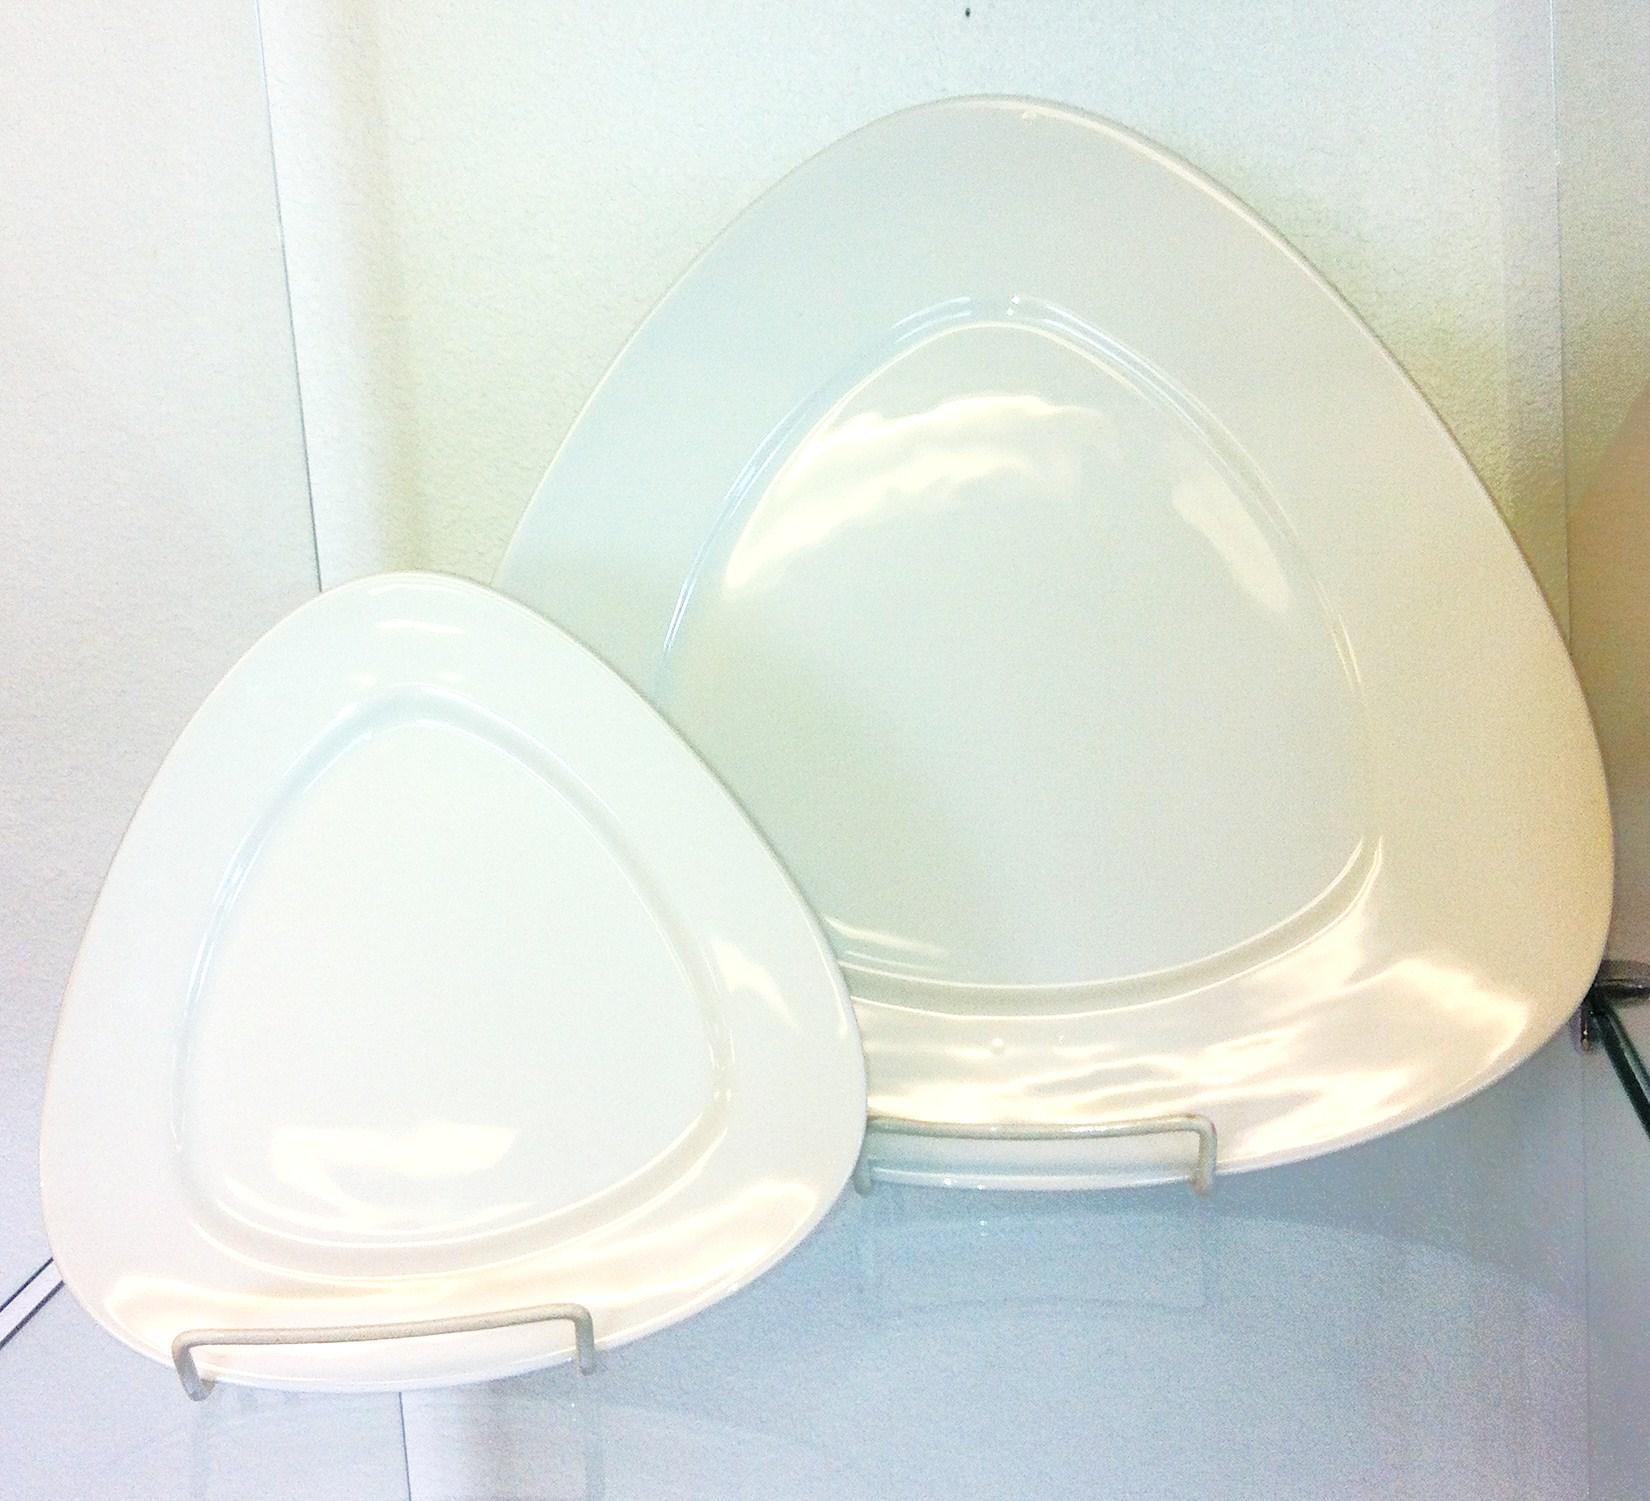 Triangle plates